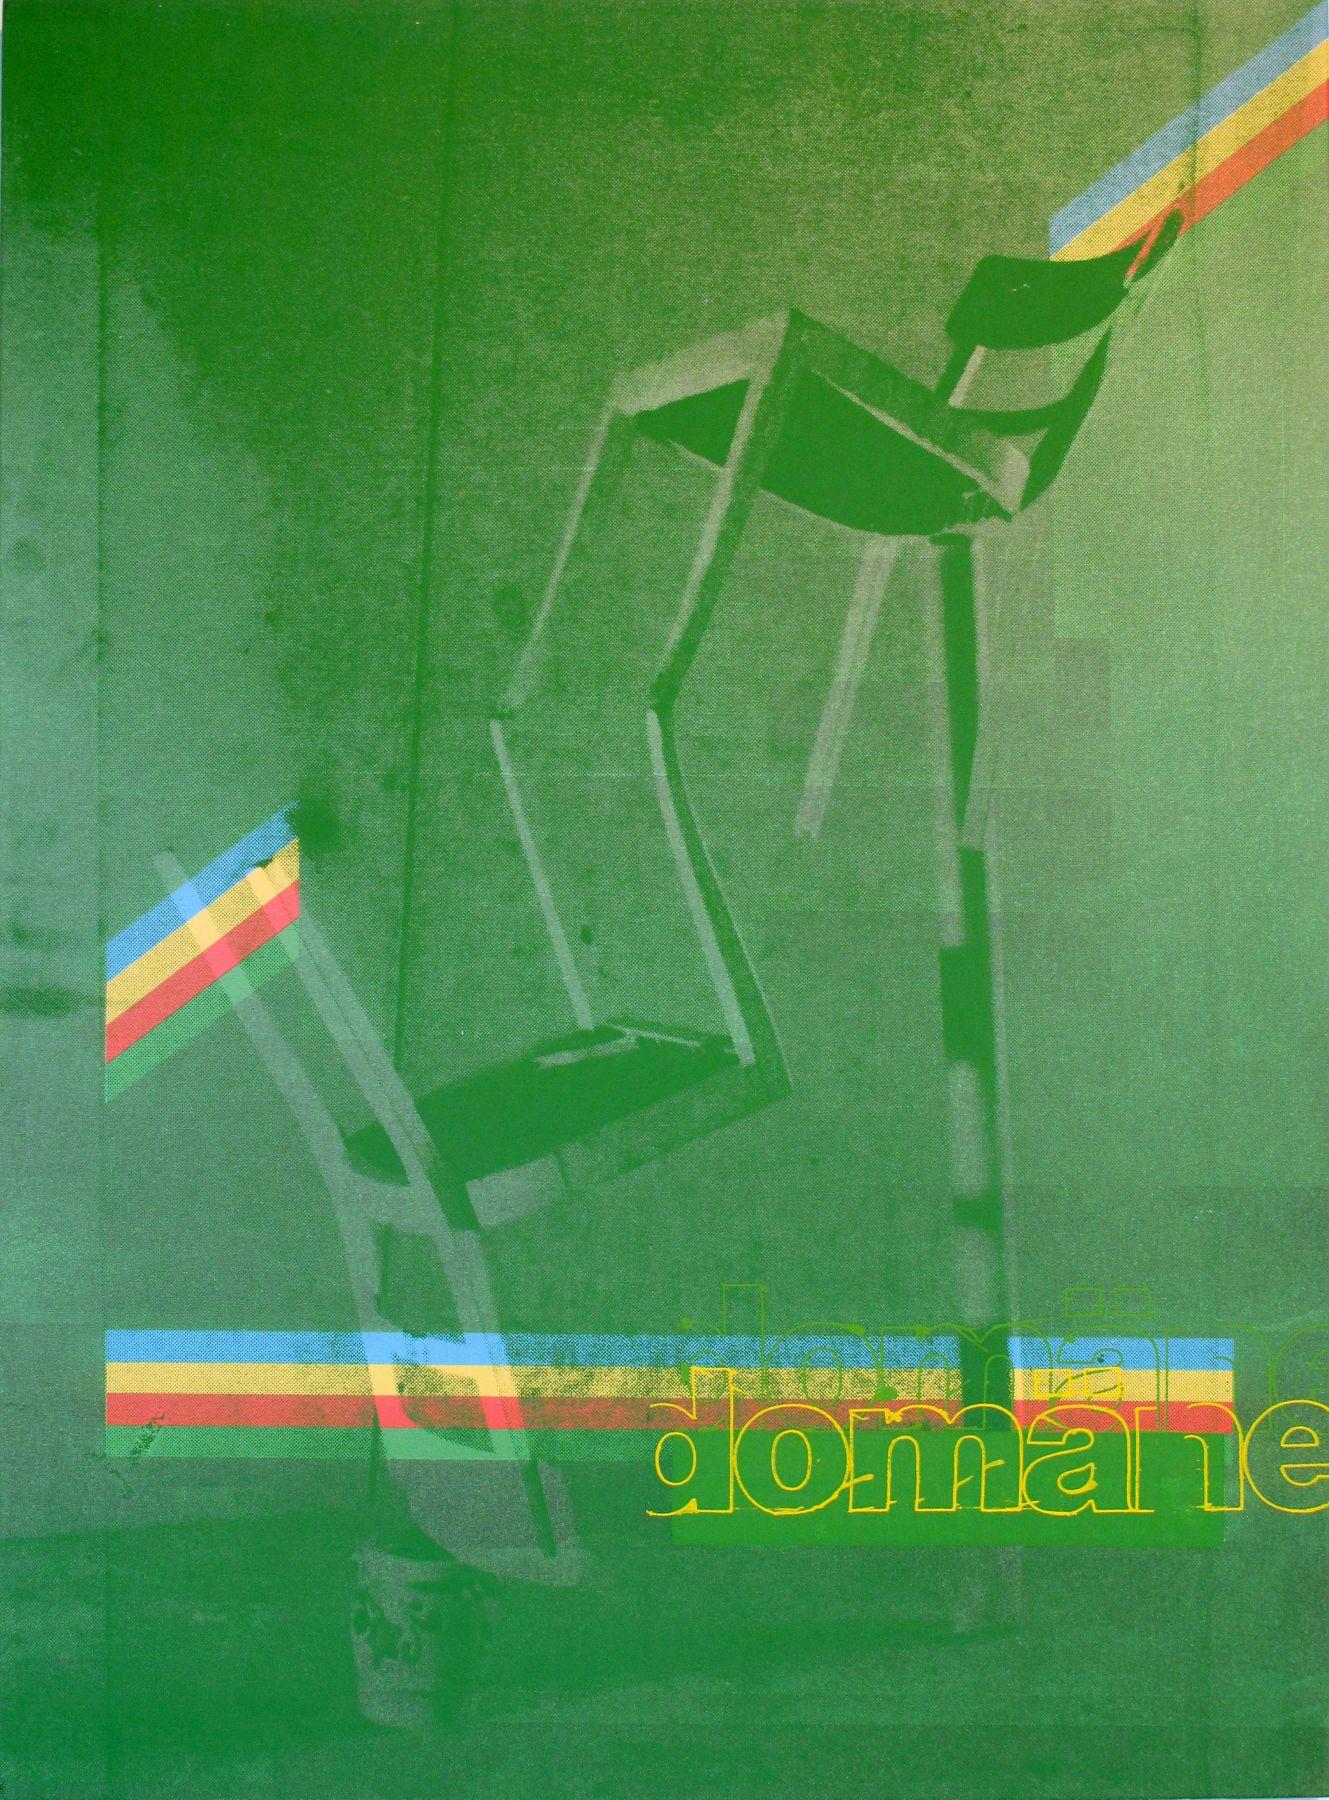 Guyton \ Walker  Untitled (Domane Green Chair) 2005